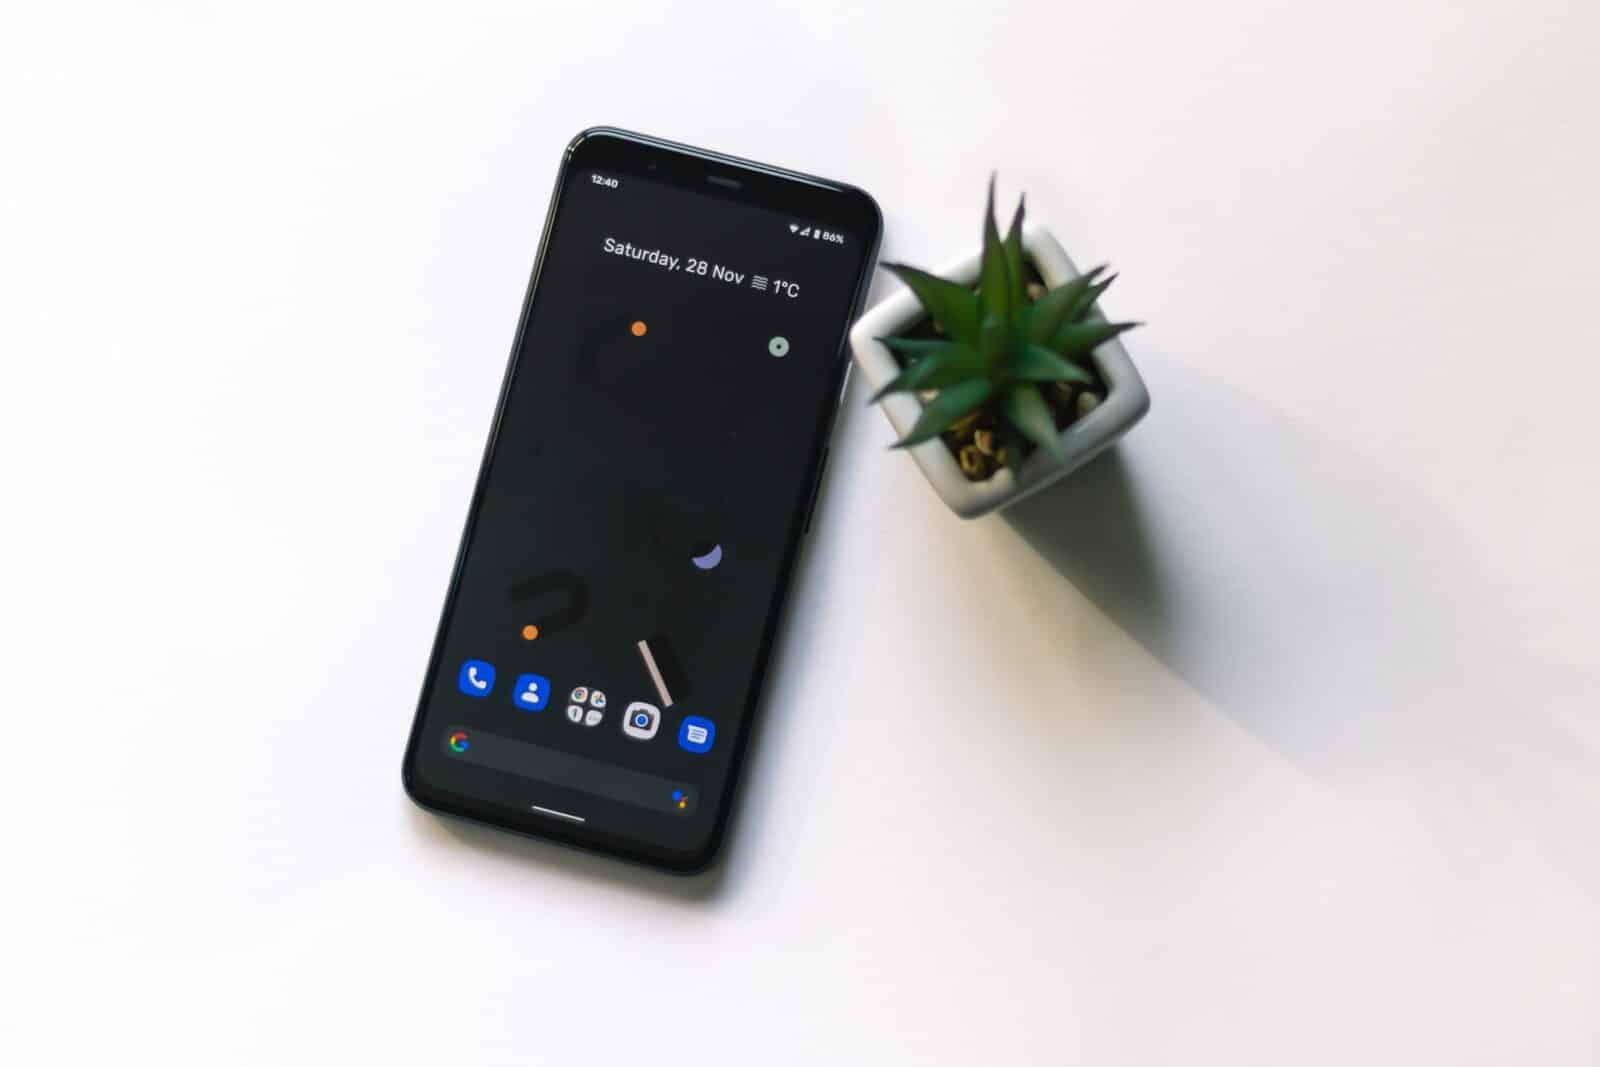 changer-delai-mise-veille-ecran-smartphone-android